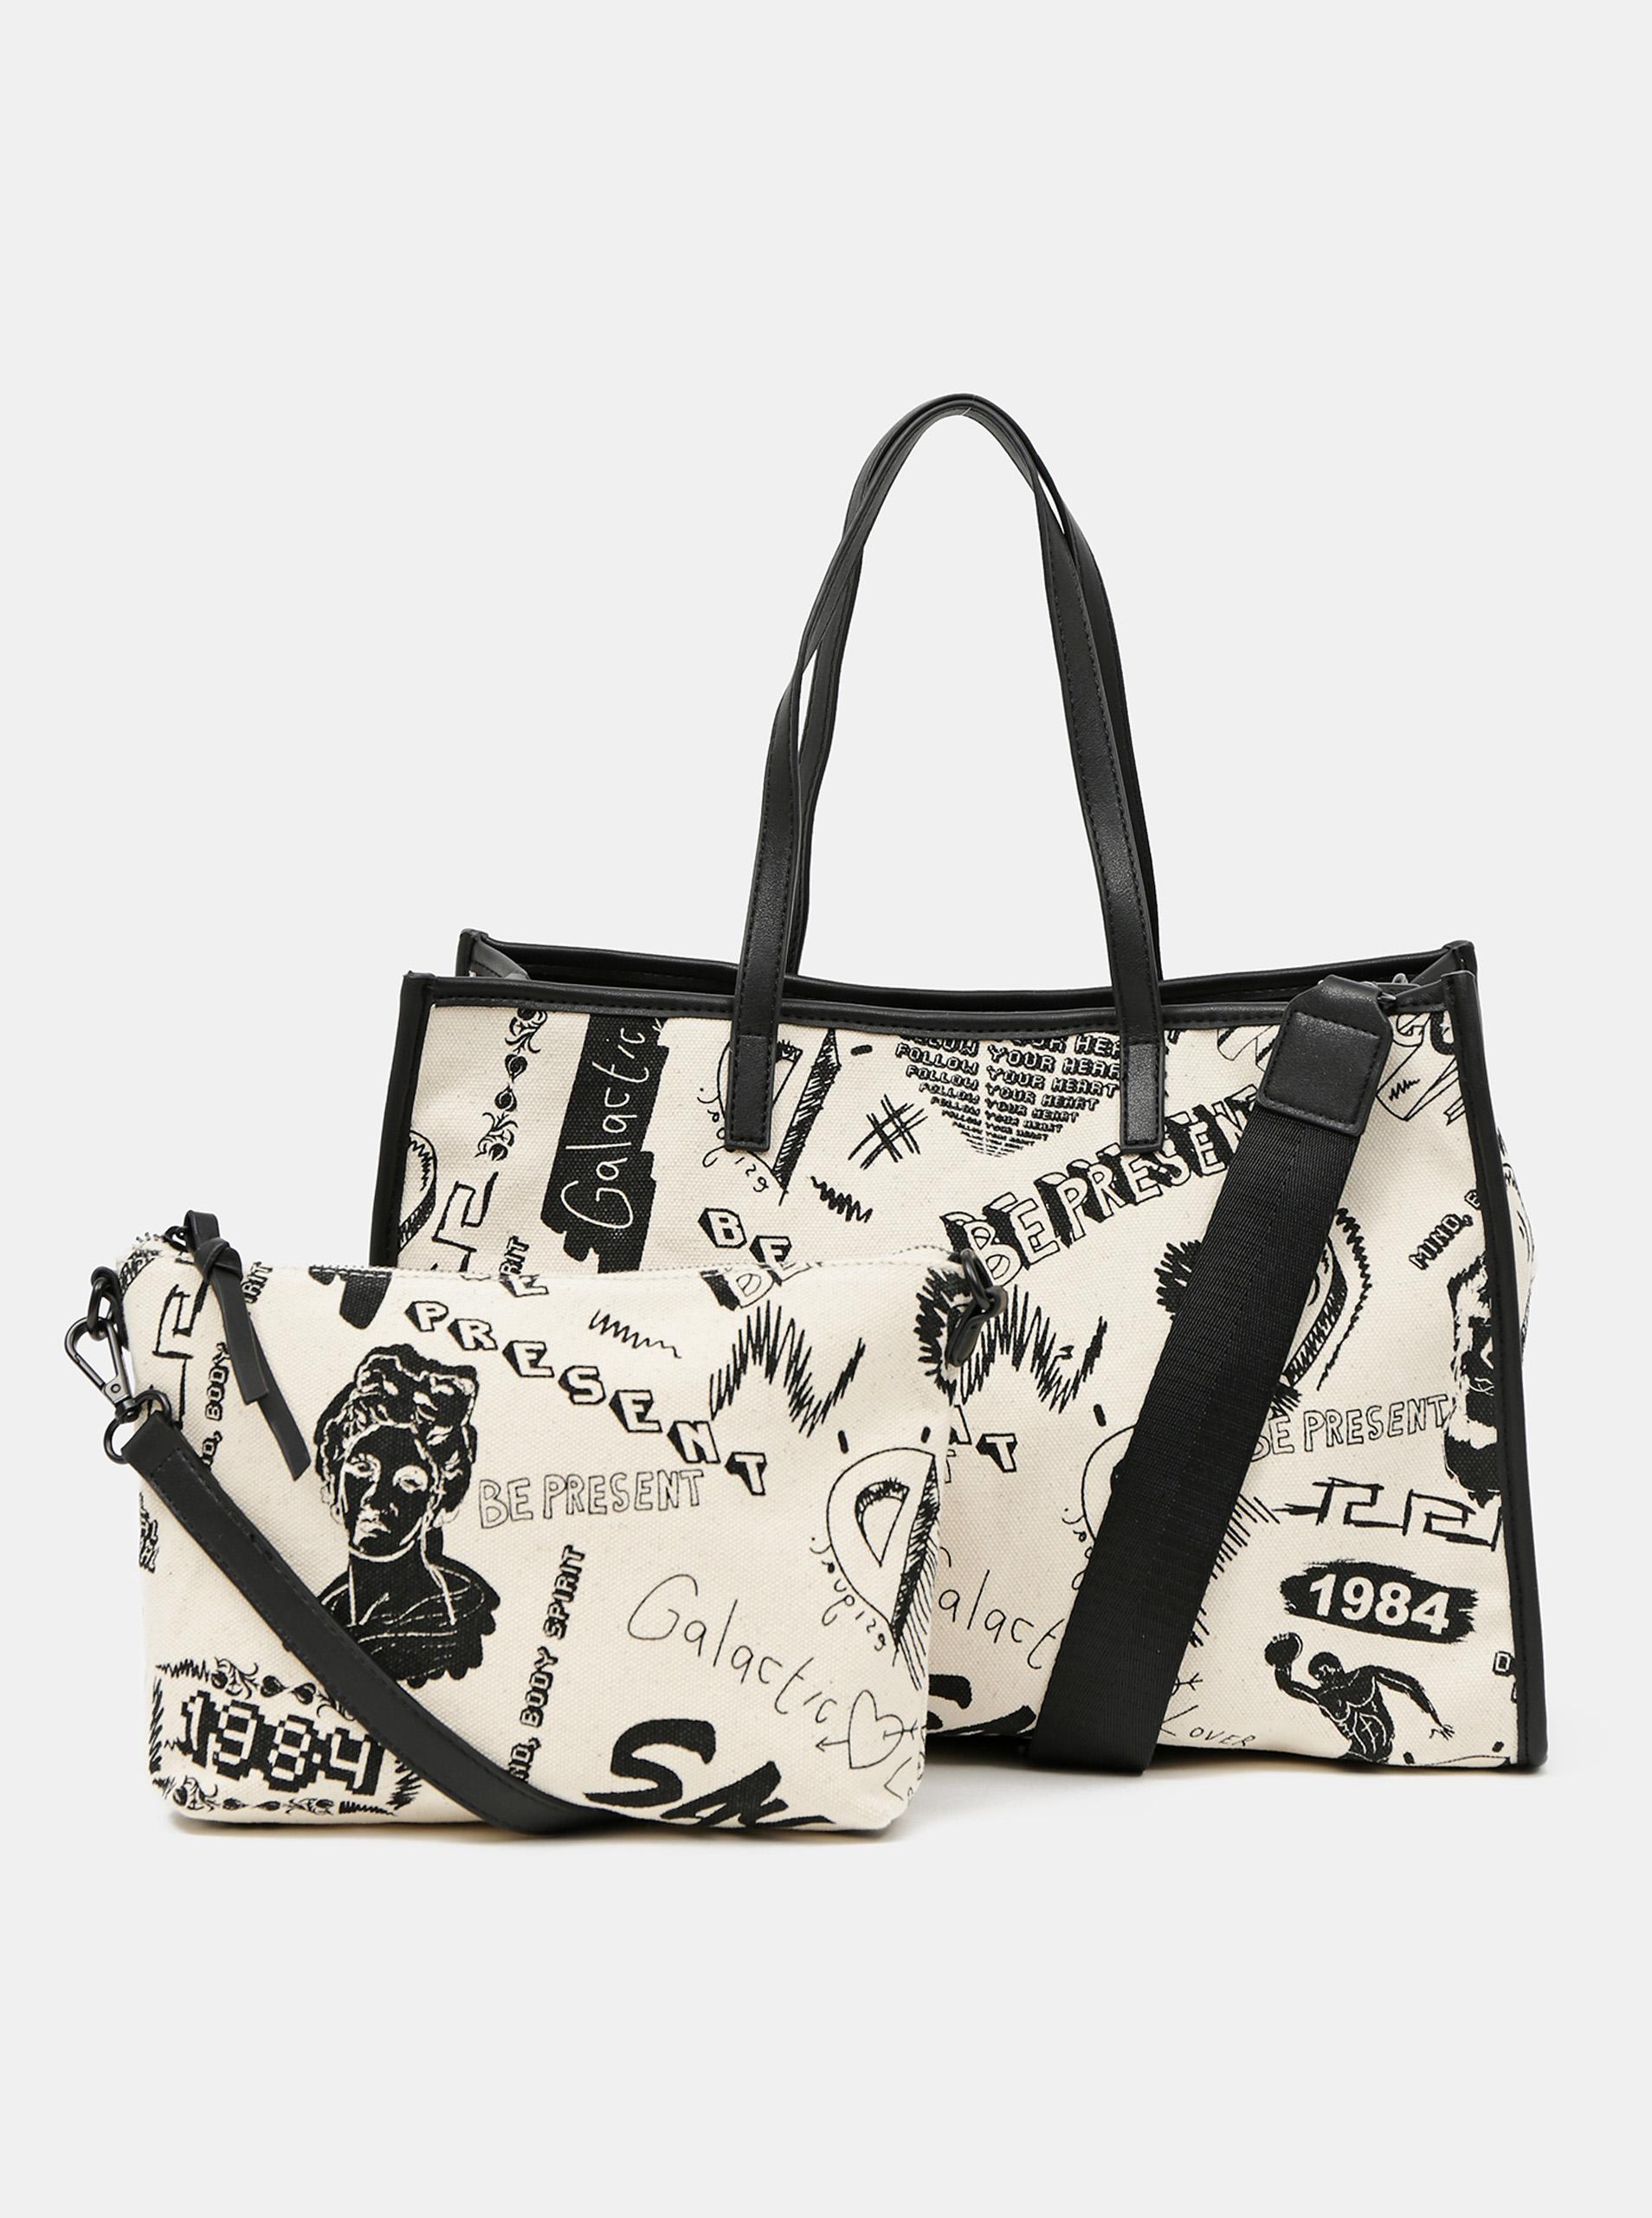 Desigual cream / cream handbag